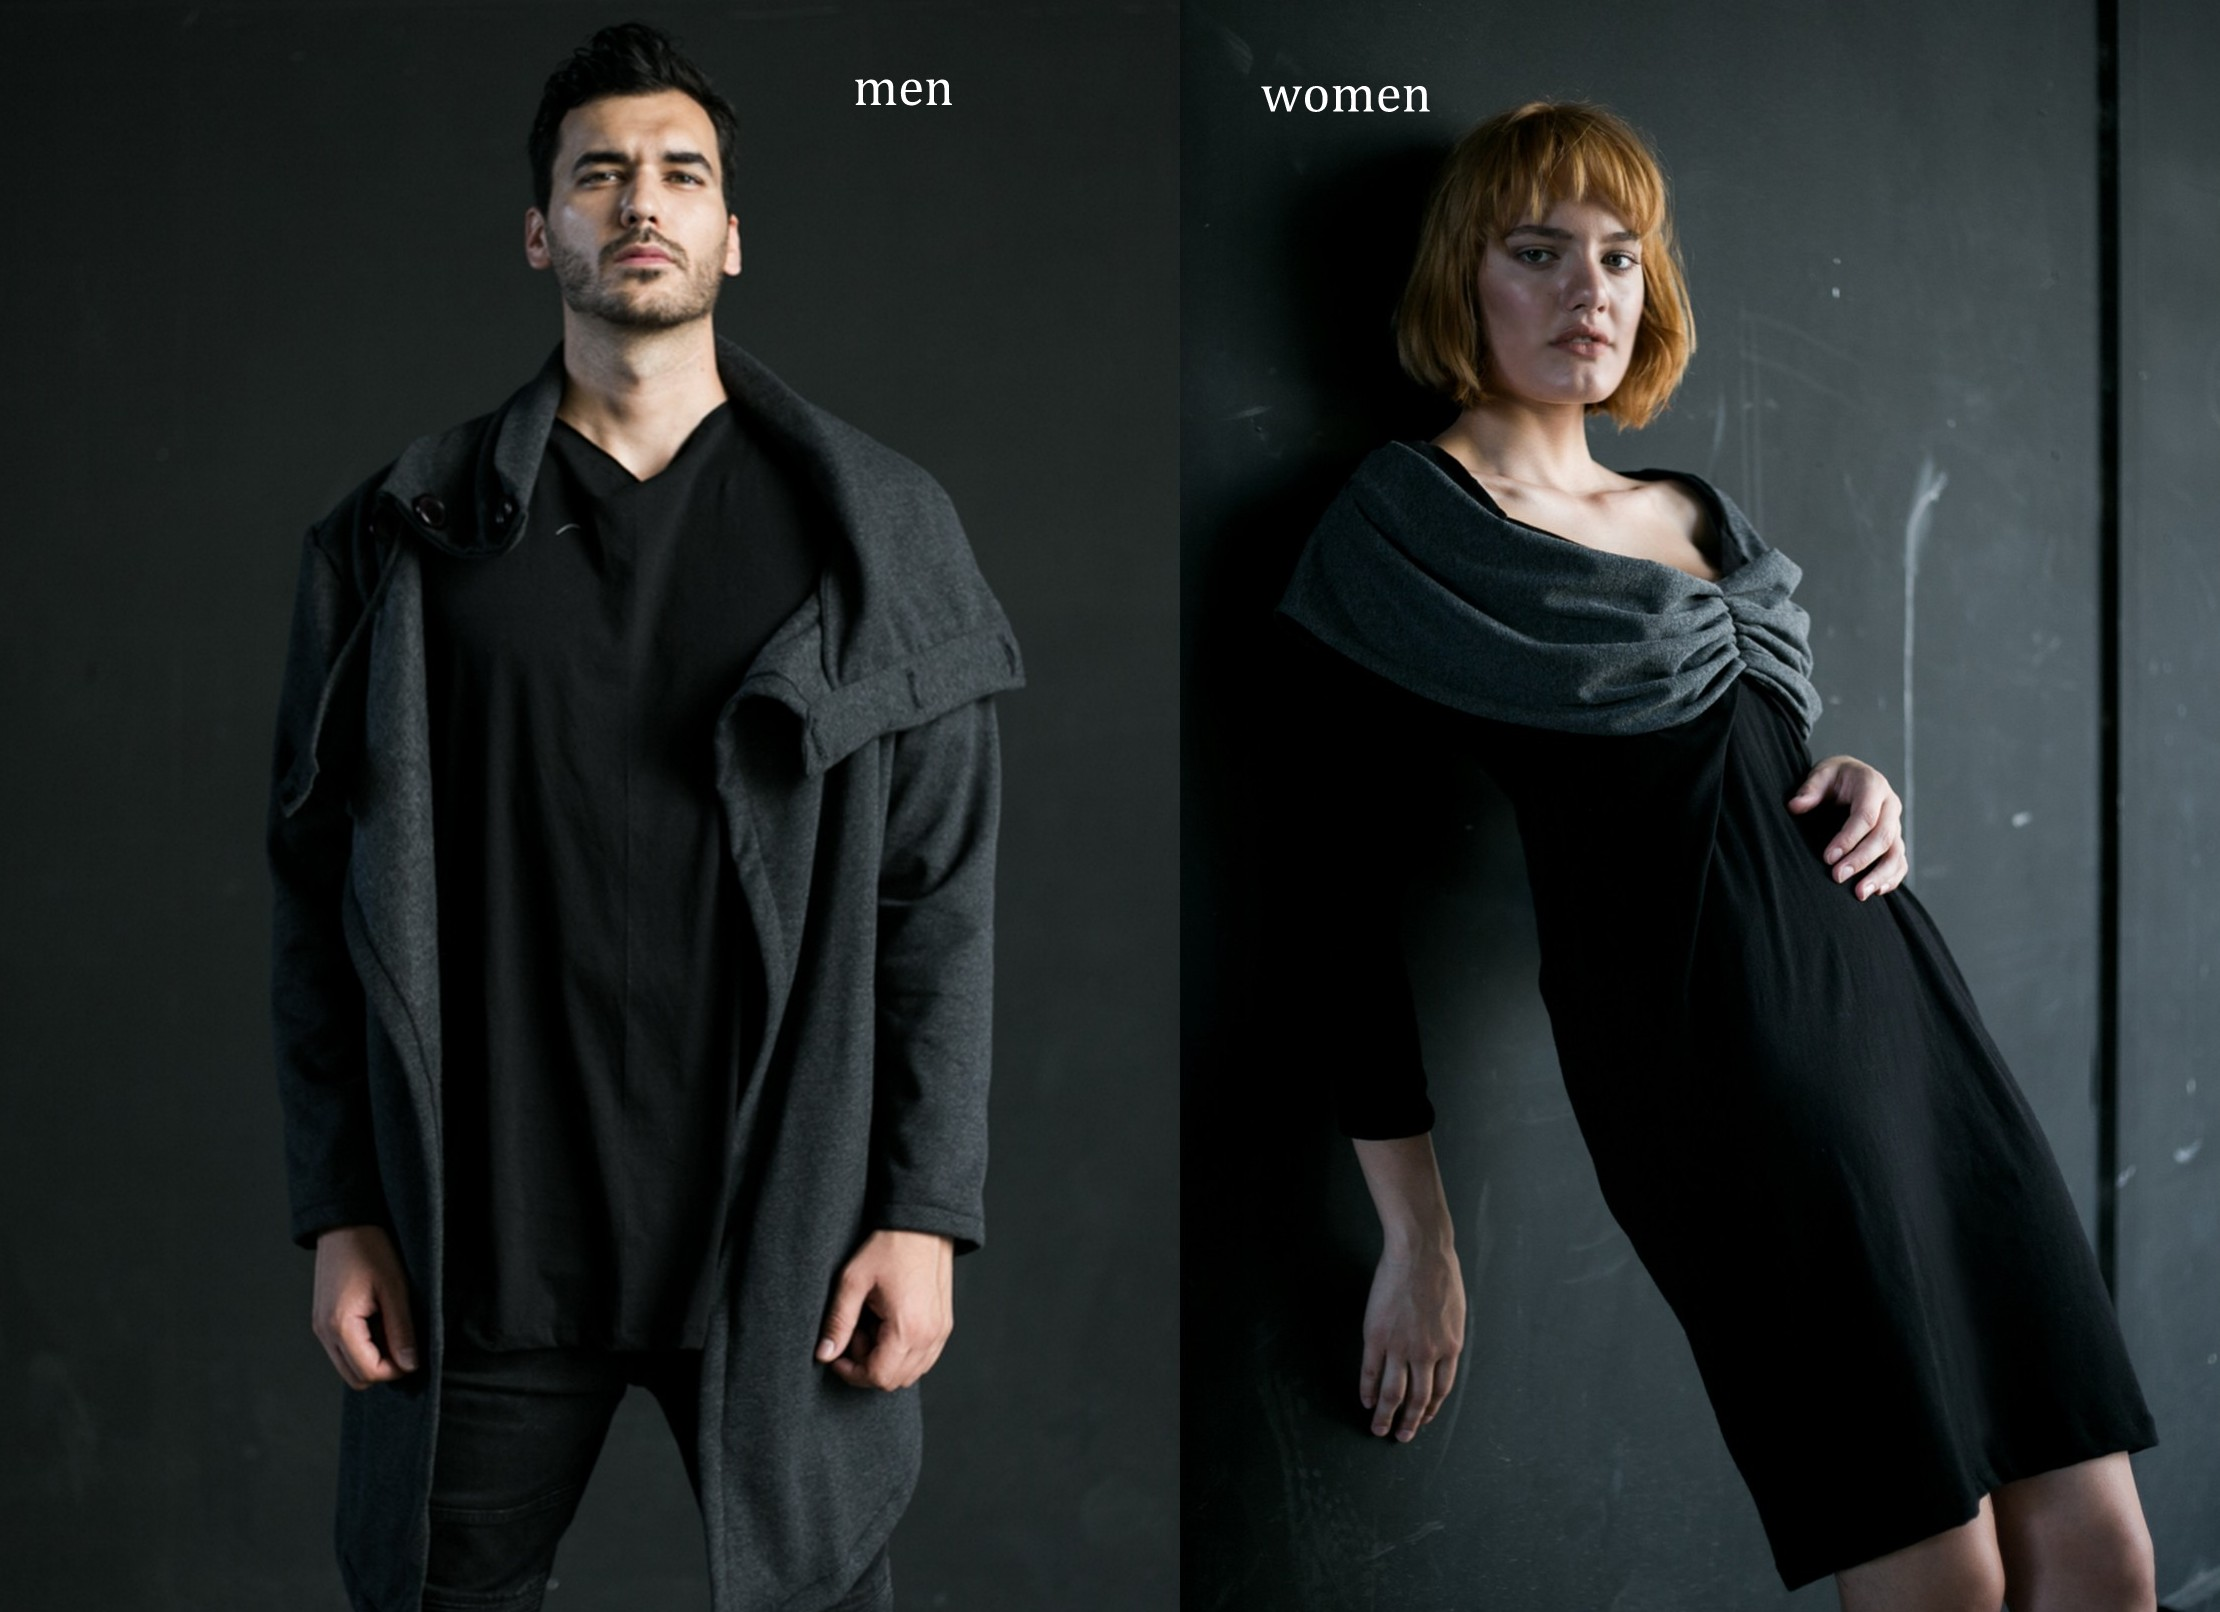 cfd5dacbcab Diana Pan | DP fashion | Γυναικεία ρούχα | Ανδρικά ρούχα | Φορέματα